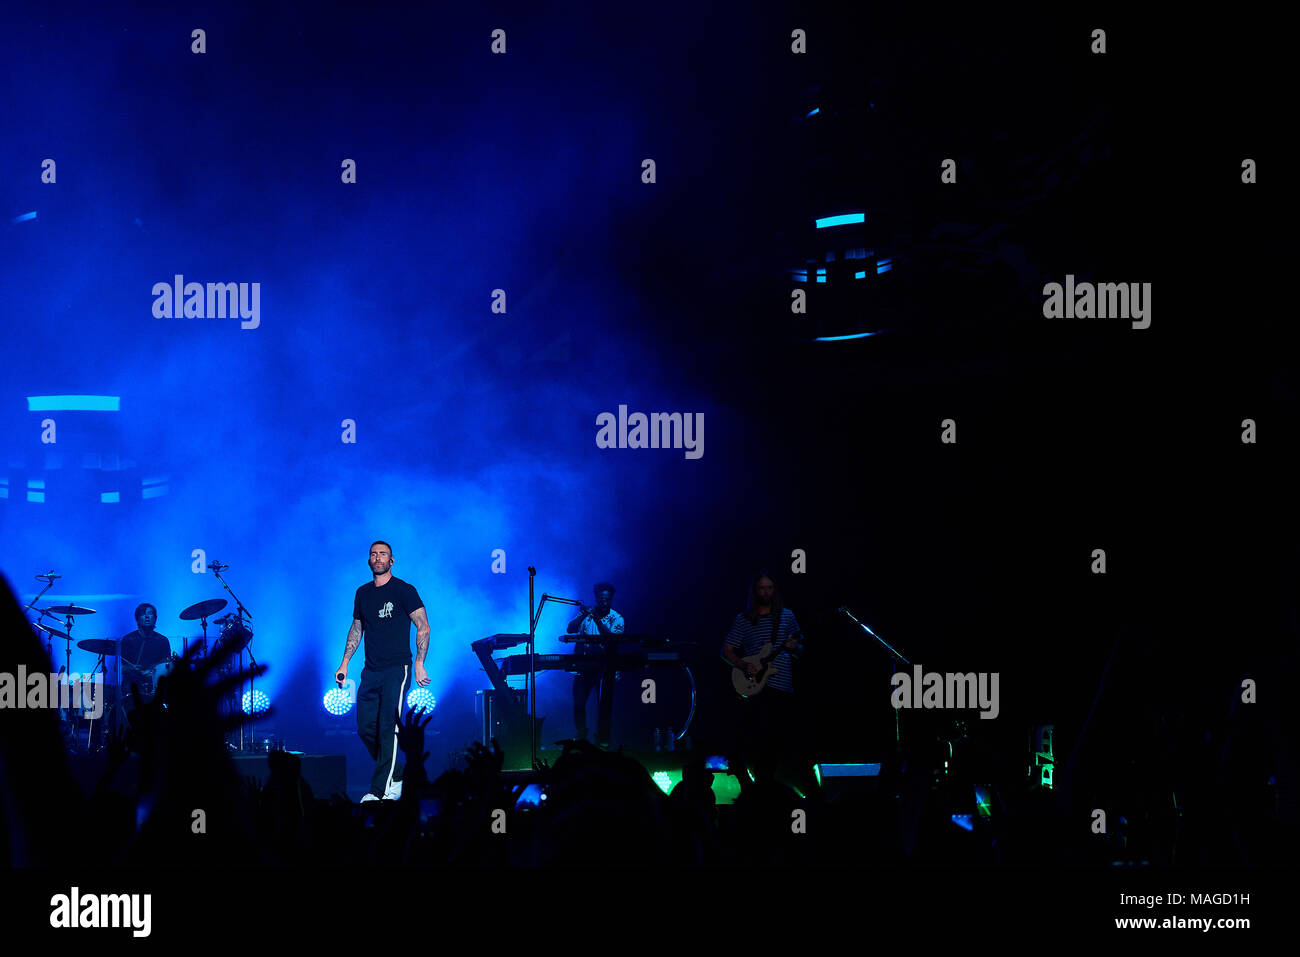 San Antonio, TX, USA  1st April 2018, Maroon 5 plays a free concert